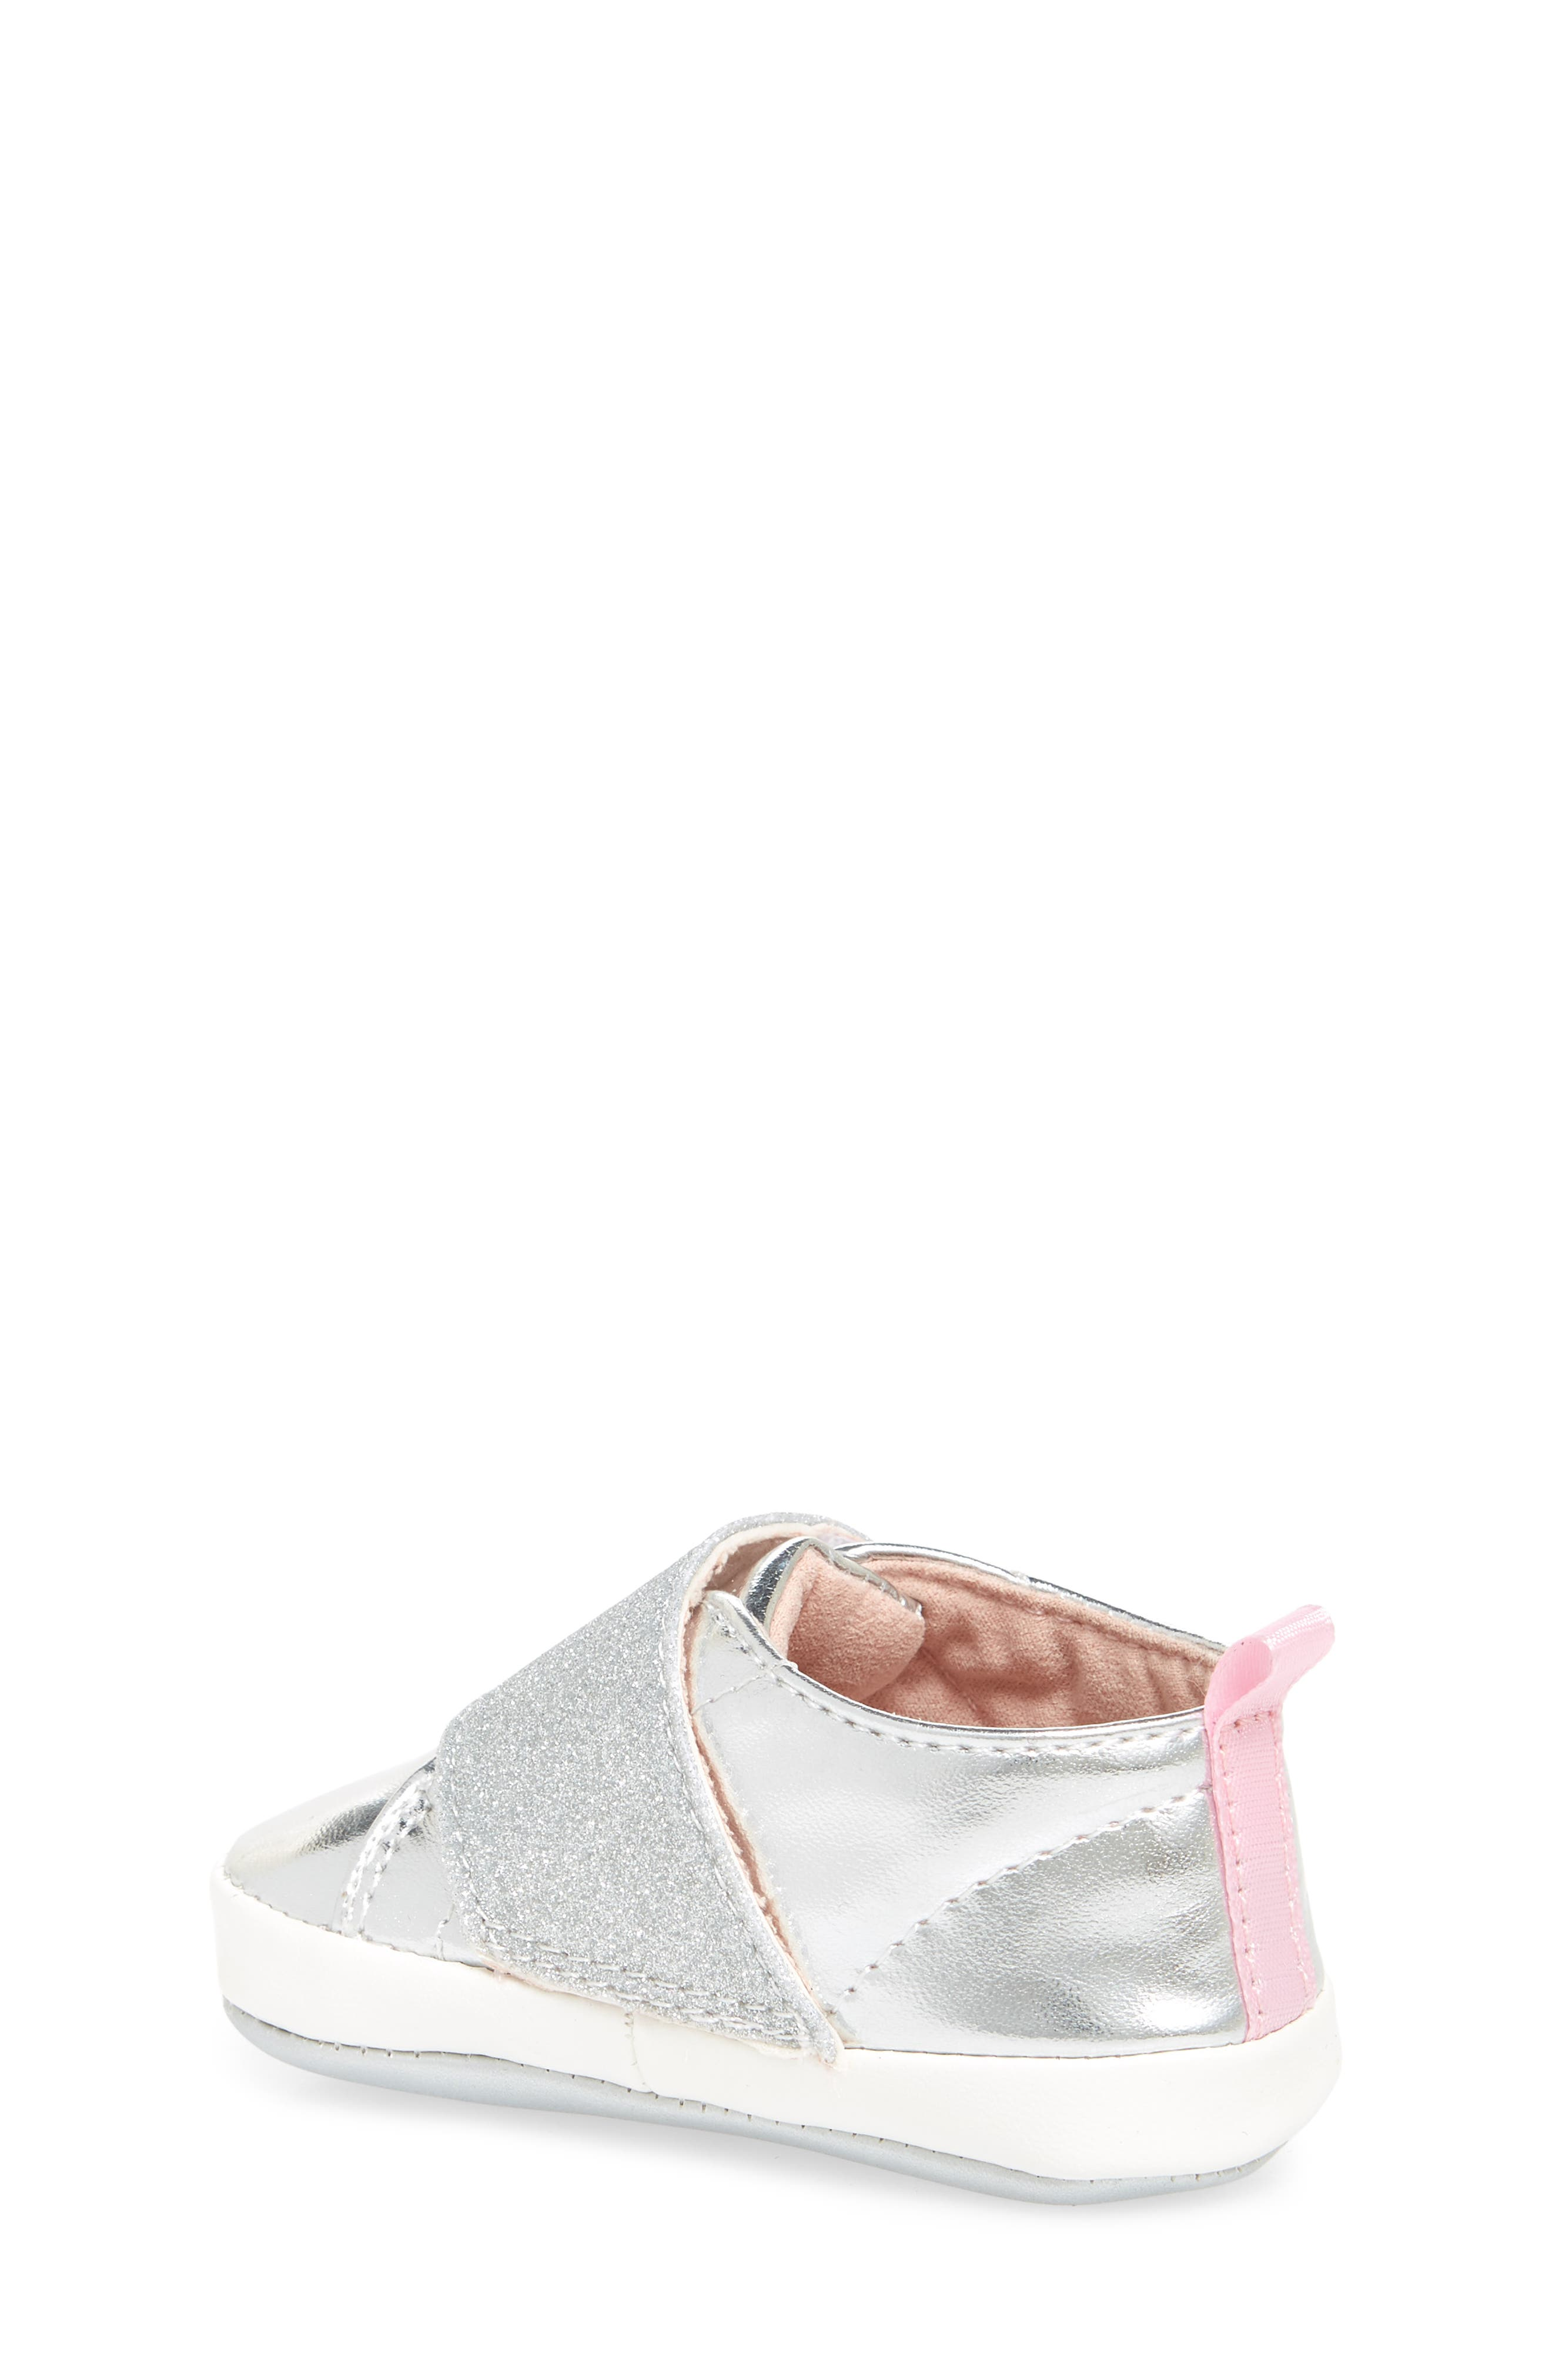 JESSICA SIMPSON,                             Glitter Crib Sneaker,                             Alternate thumbnail 2, color,                             040